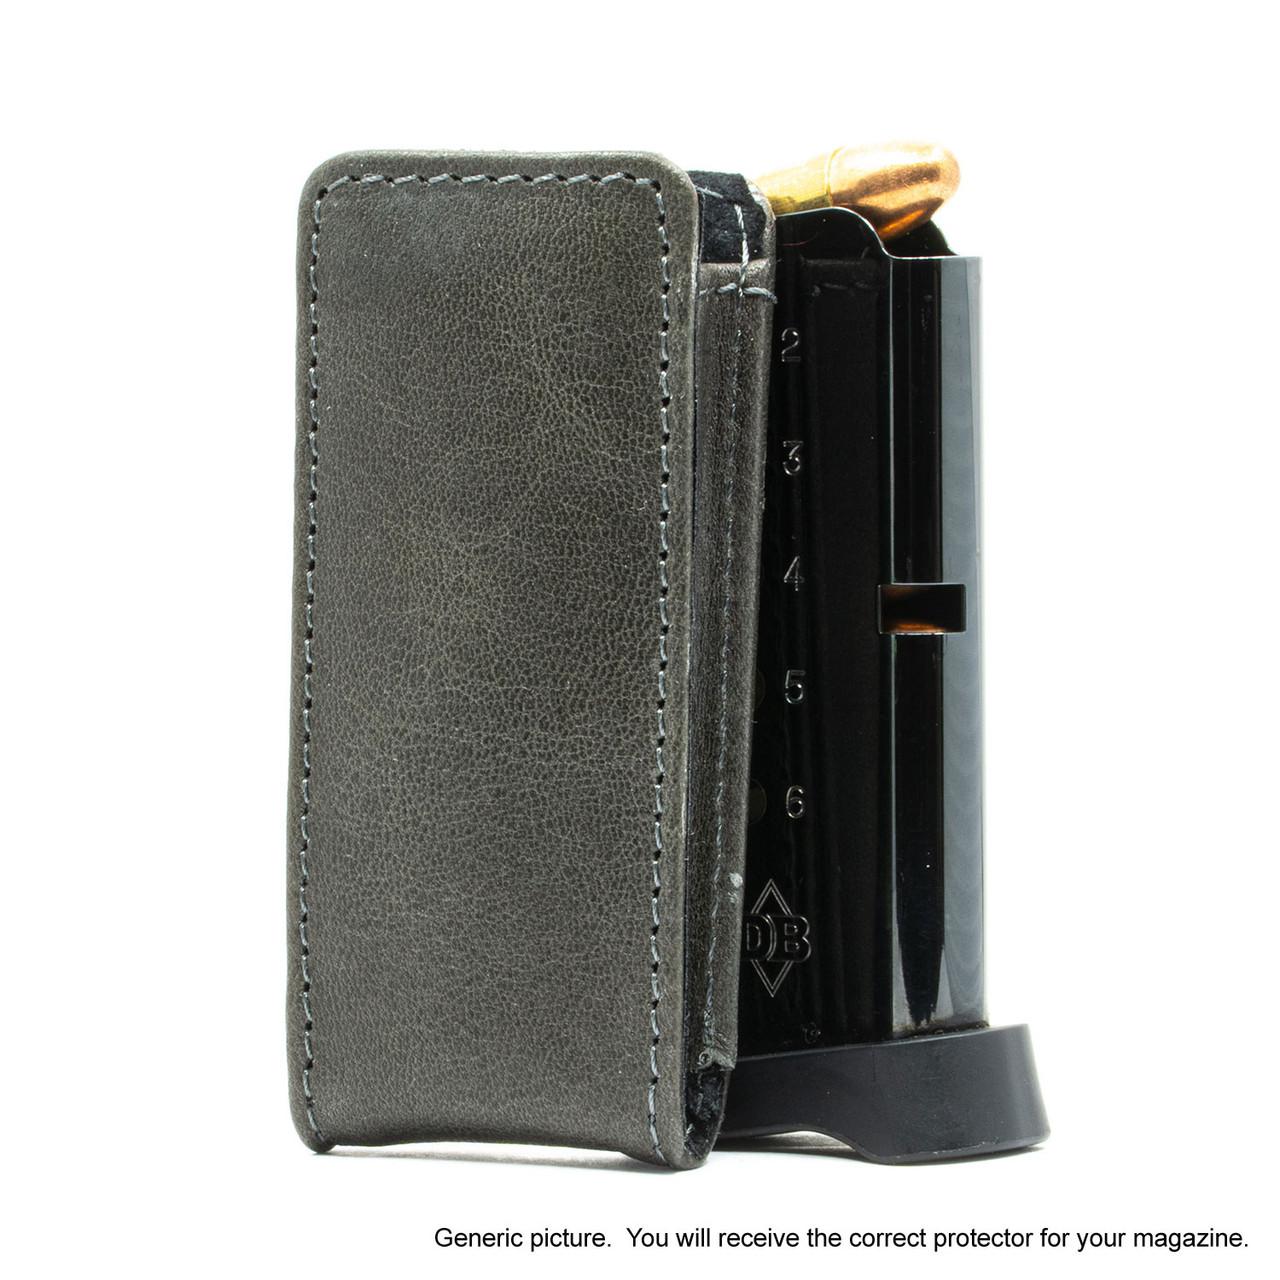 CZ 75 P07 Black Freedom Magazine Pocket Protector